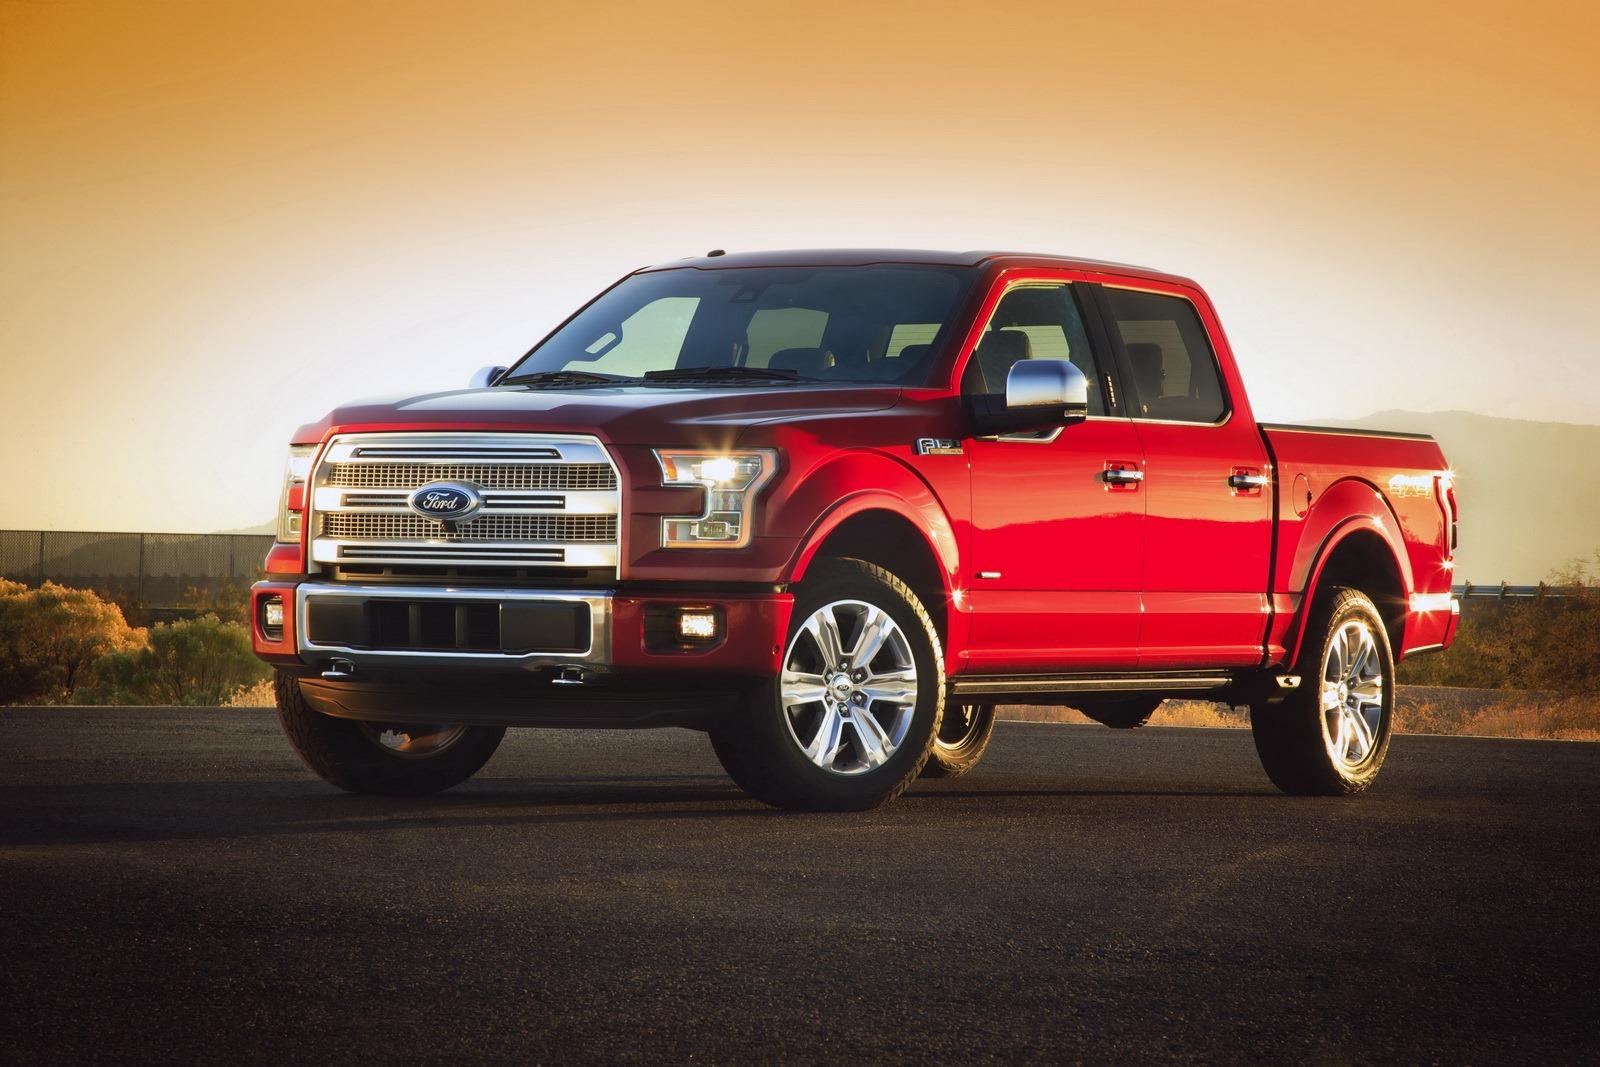 Ford-F-150-1%25255B2%25255D.jpg